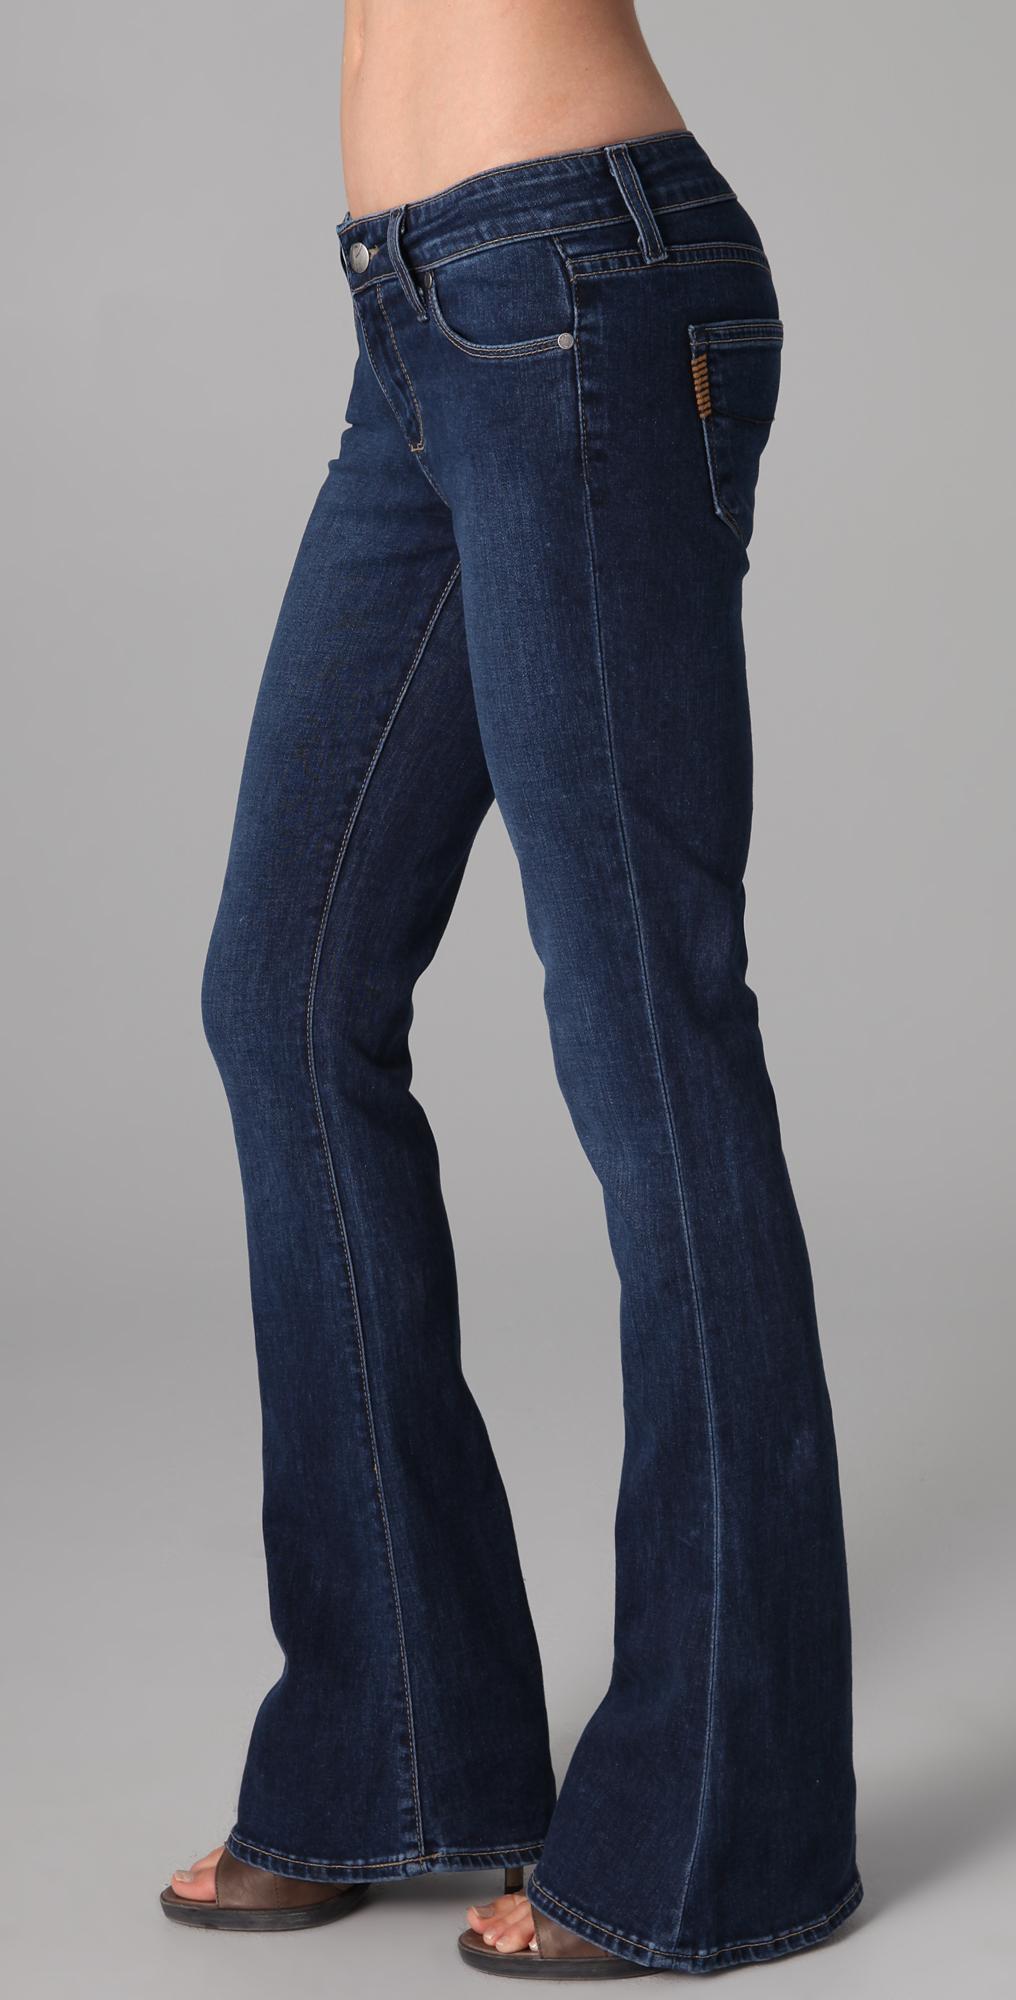 Paige Lou Lou Petite Flare Jeans Shopbop Save Up To 25 Use Code